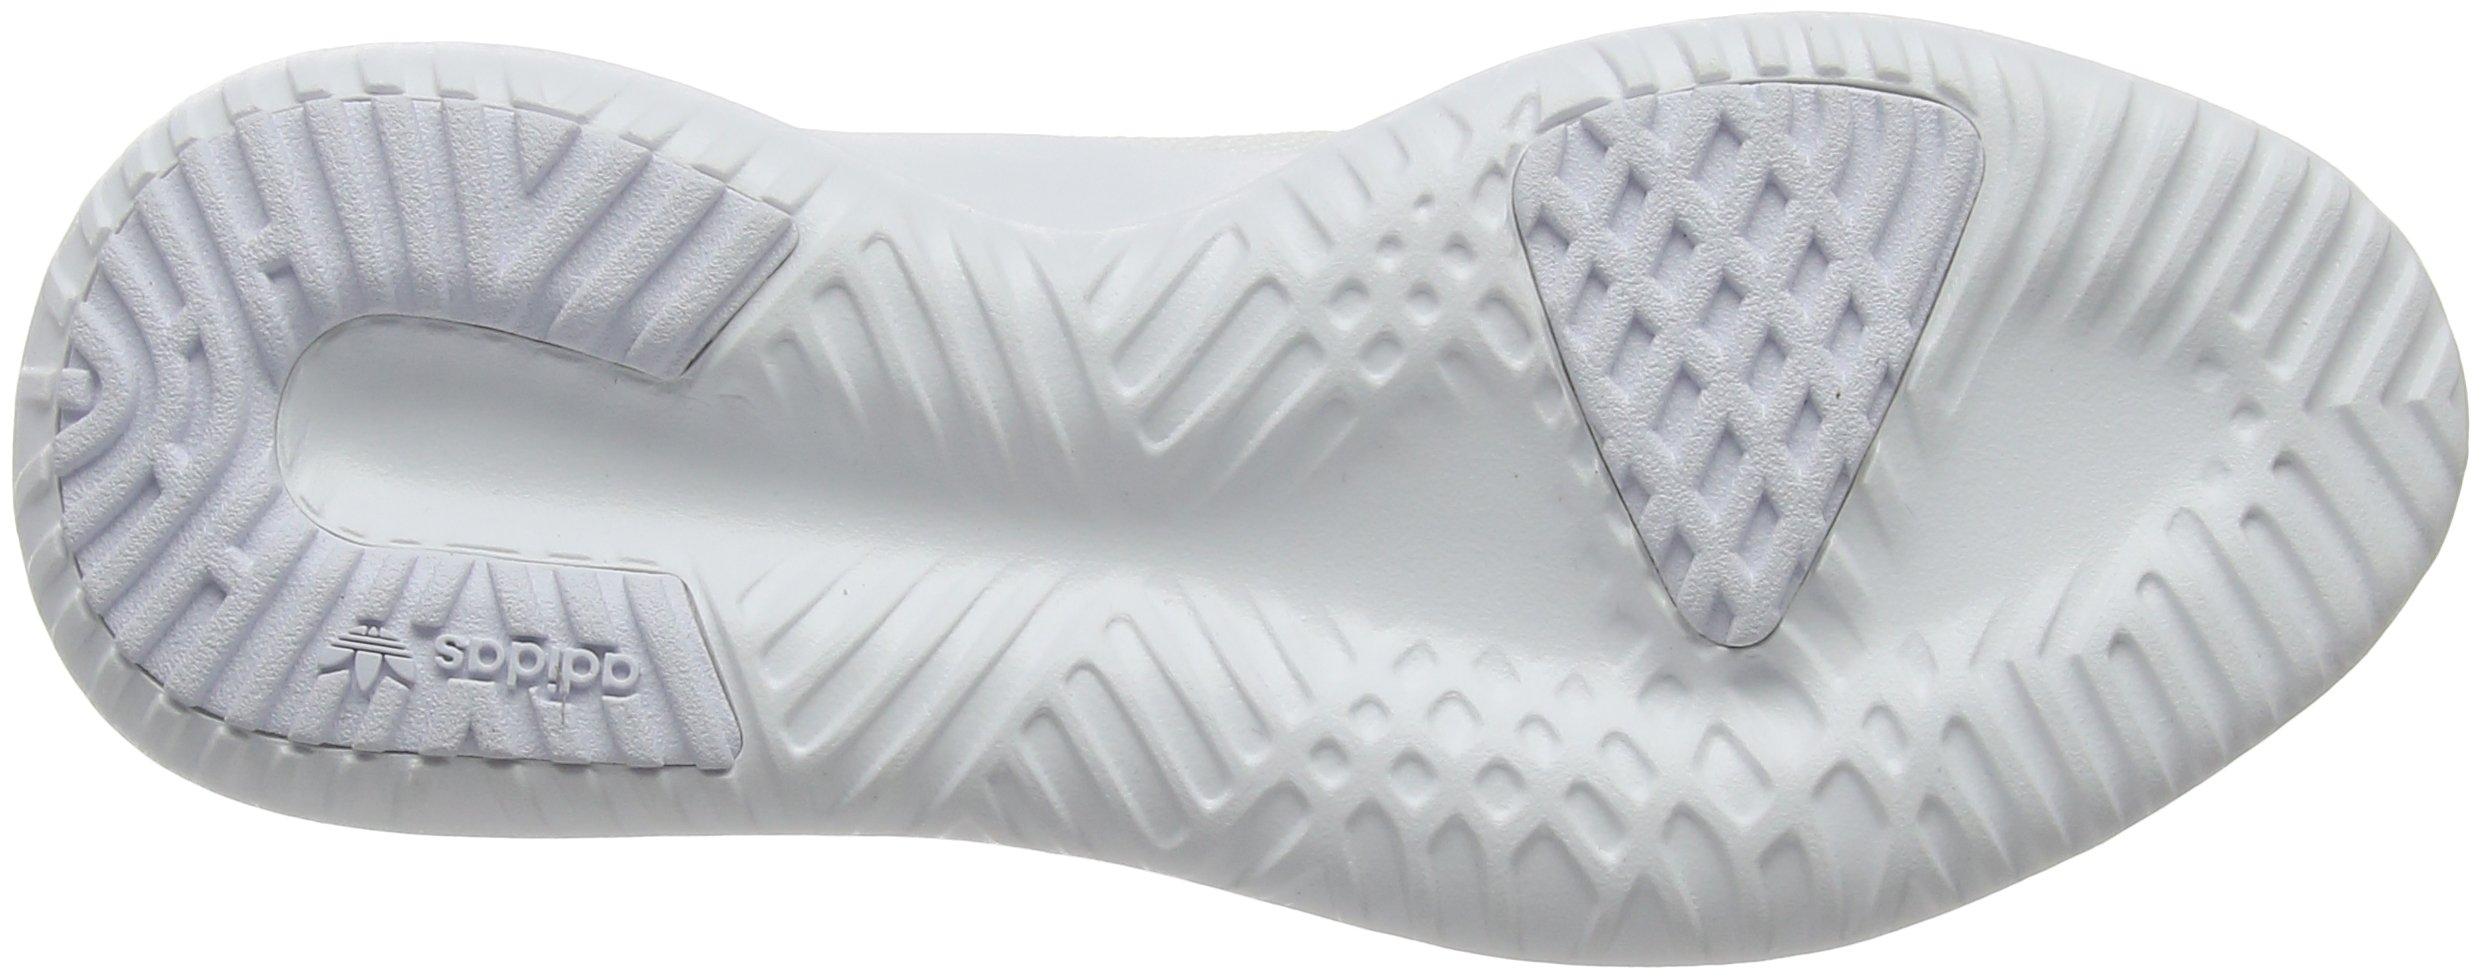 check out ed2b2 fbc18 adidas Tubular Shadow, Scarpe da Ginnastica Unisex-Bambini – Spesavip